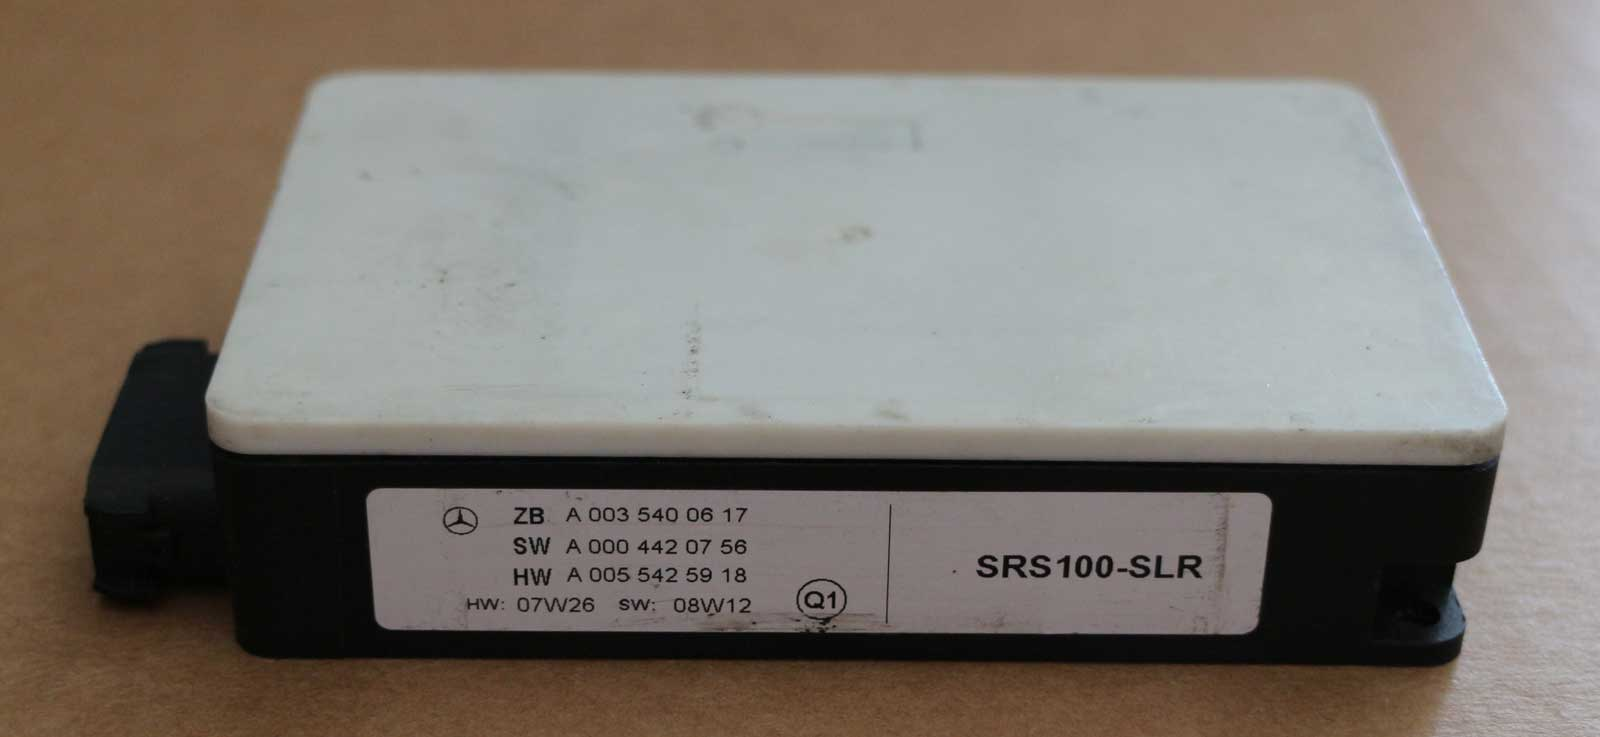 Mercedes Benz Radarsensor F R Distronic A003 540 06 17